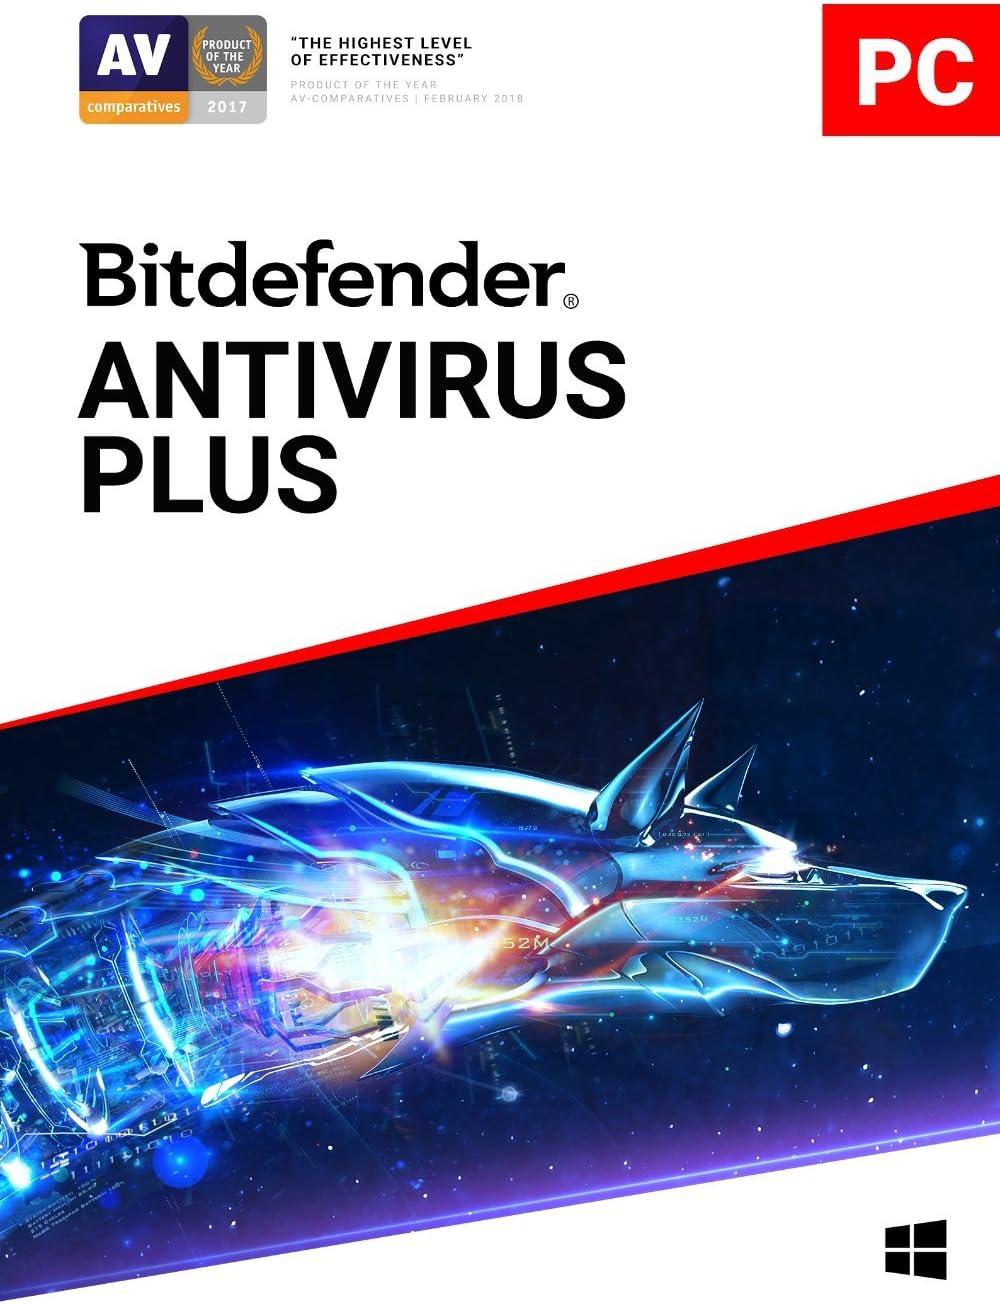 Bitdefender Antivirus latest Plus - 3 year P Subscription 2 Devices Discount is also underway